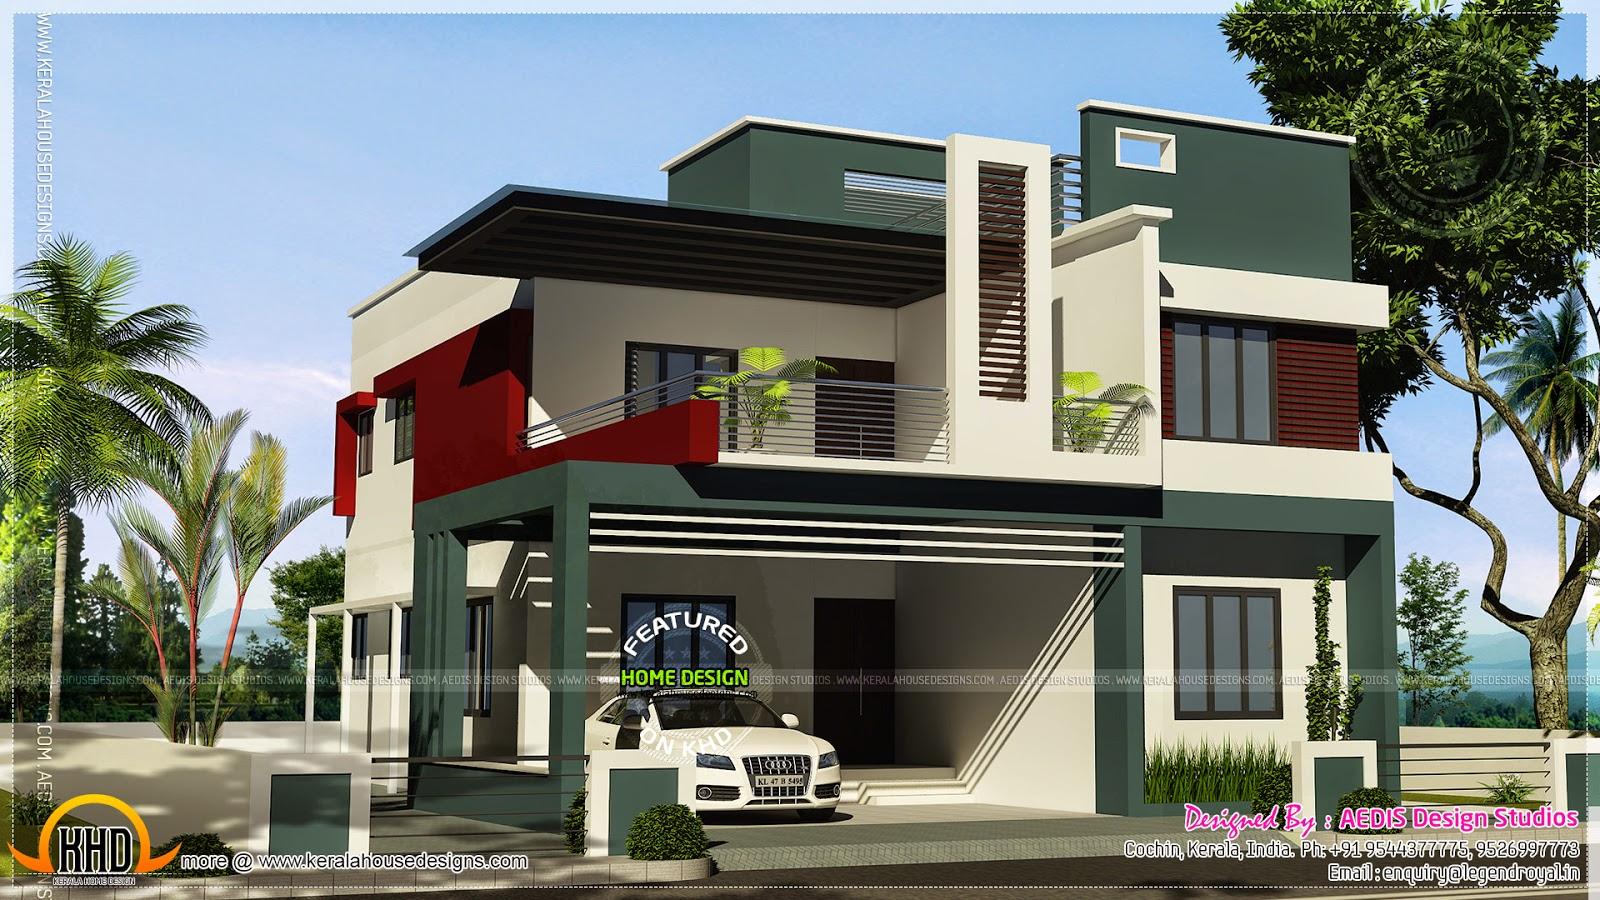 Mesmerizing south indian duplex house plans with elevation for Free indian duplex house plans